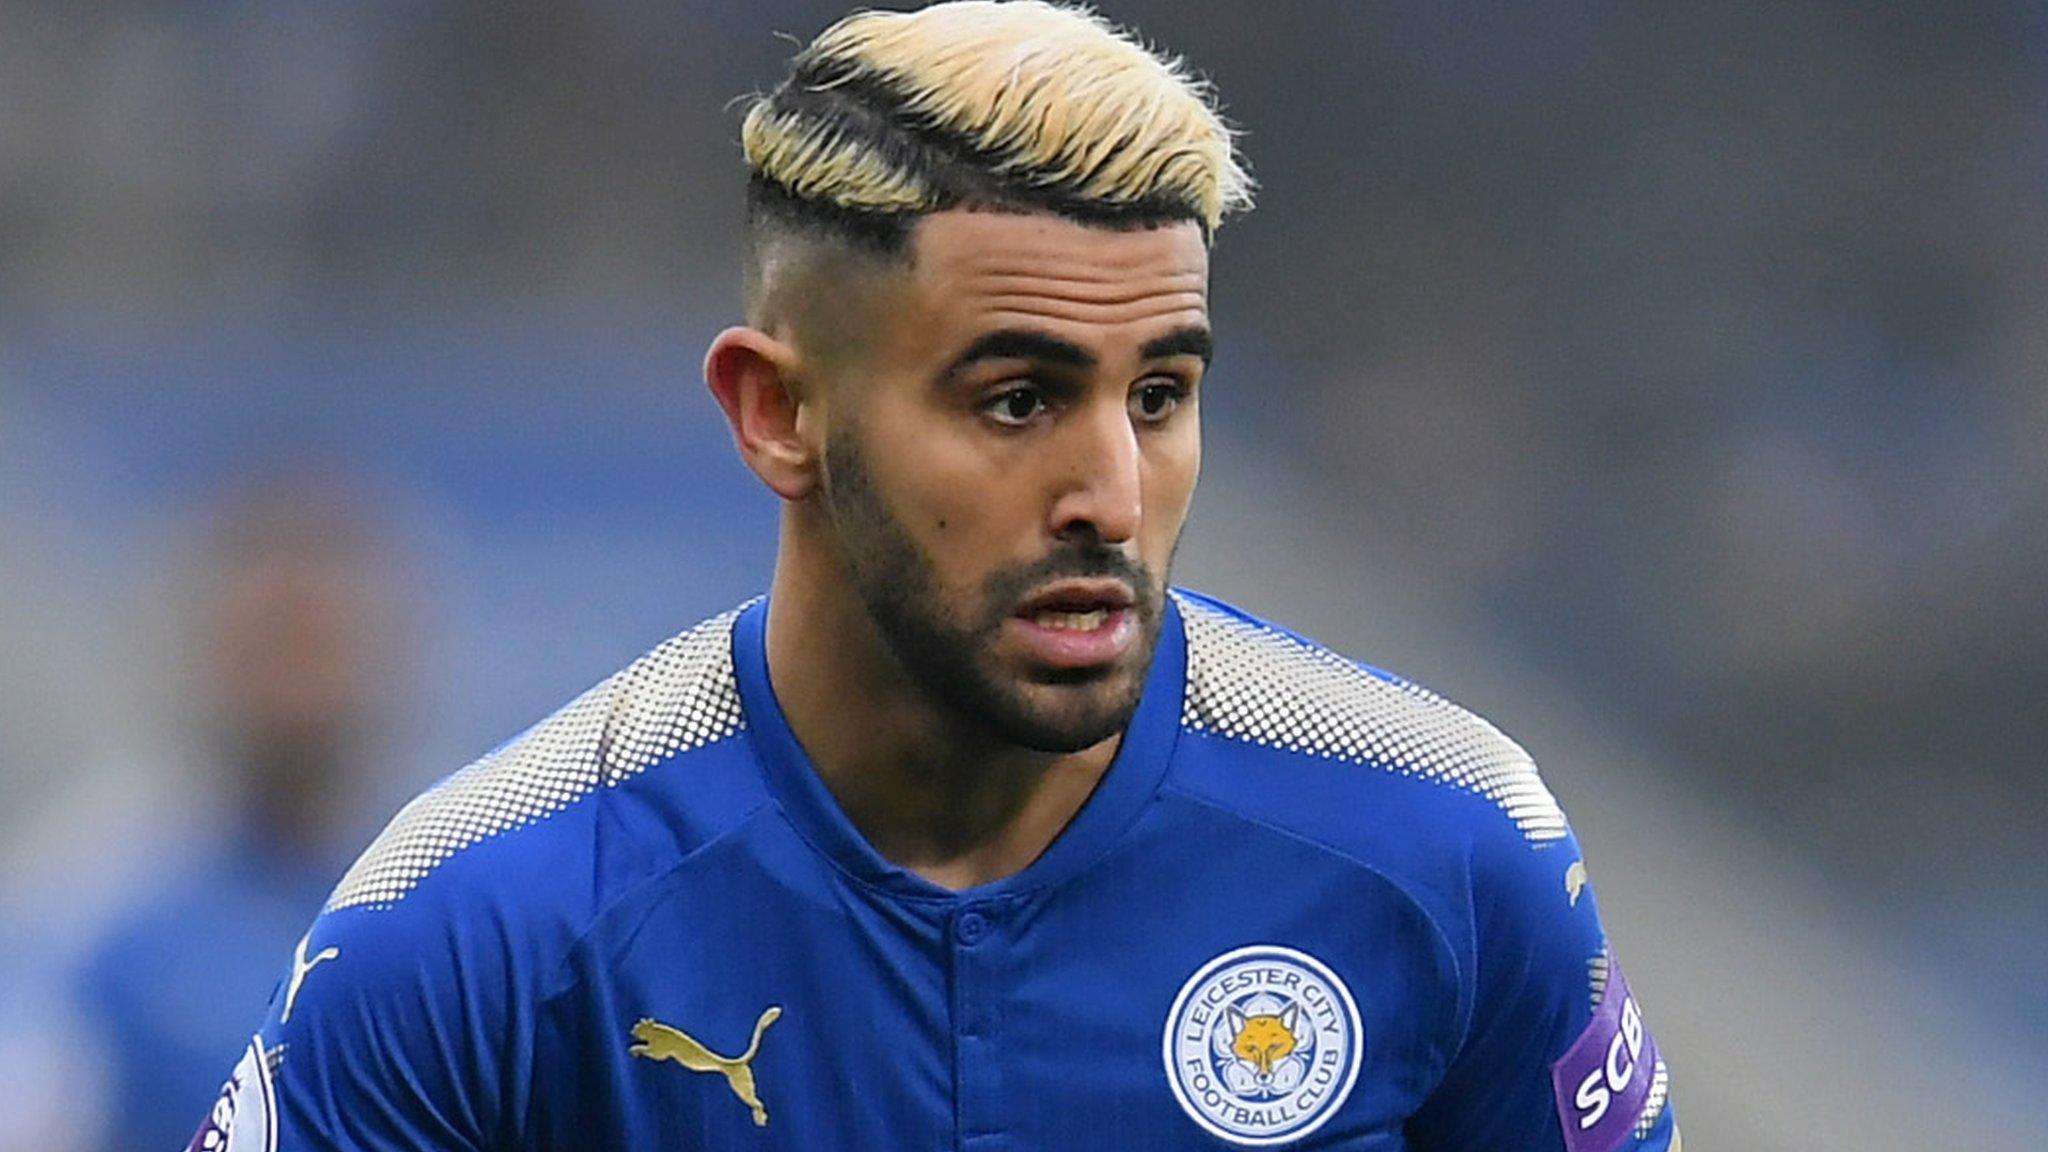 Riyad Mahrez: Leicester winger says team-mates stood by him